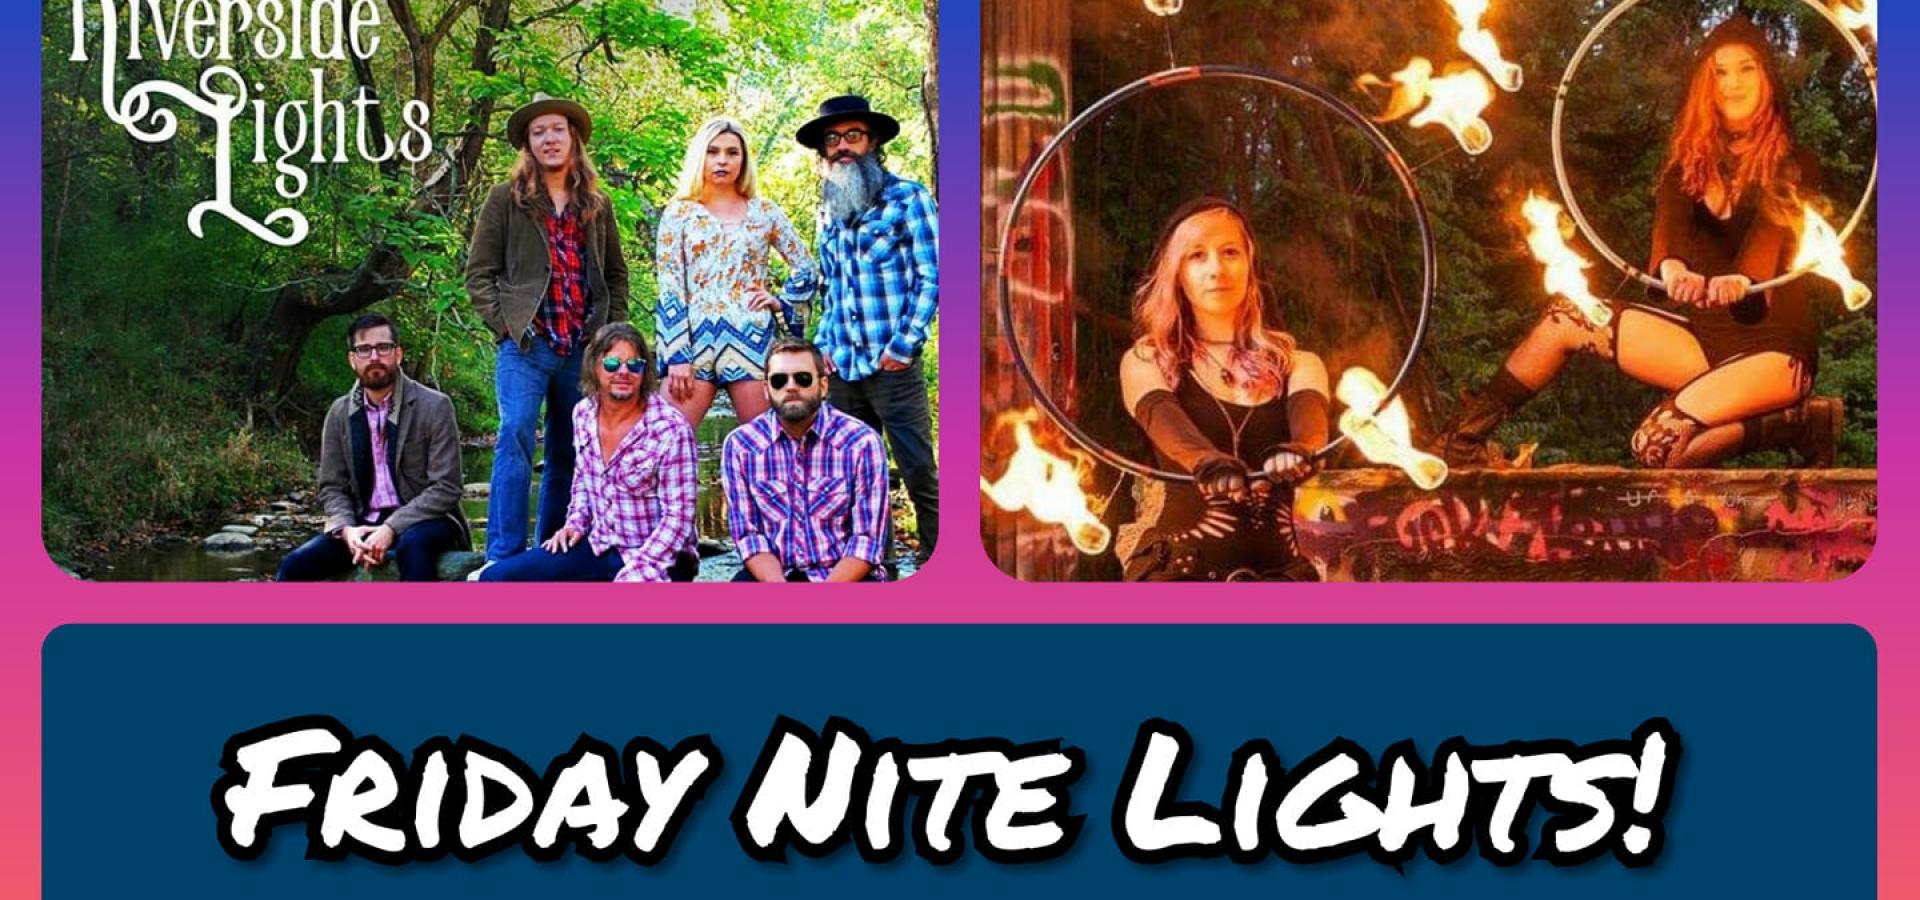 Friday Nite Lights_5-17-19